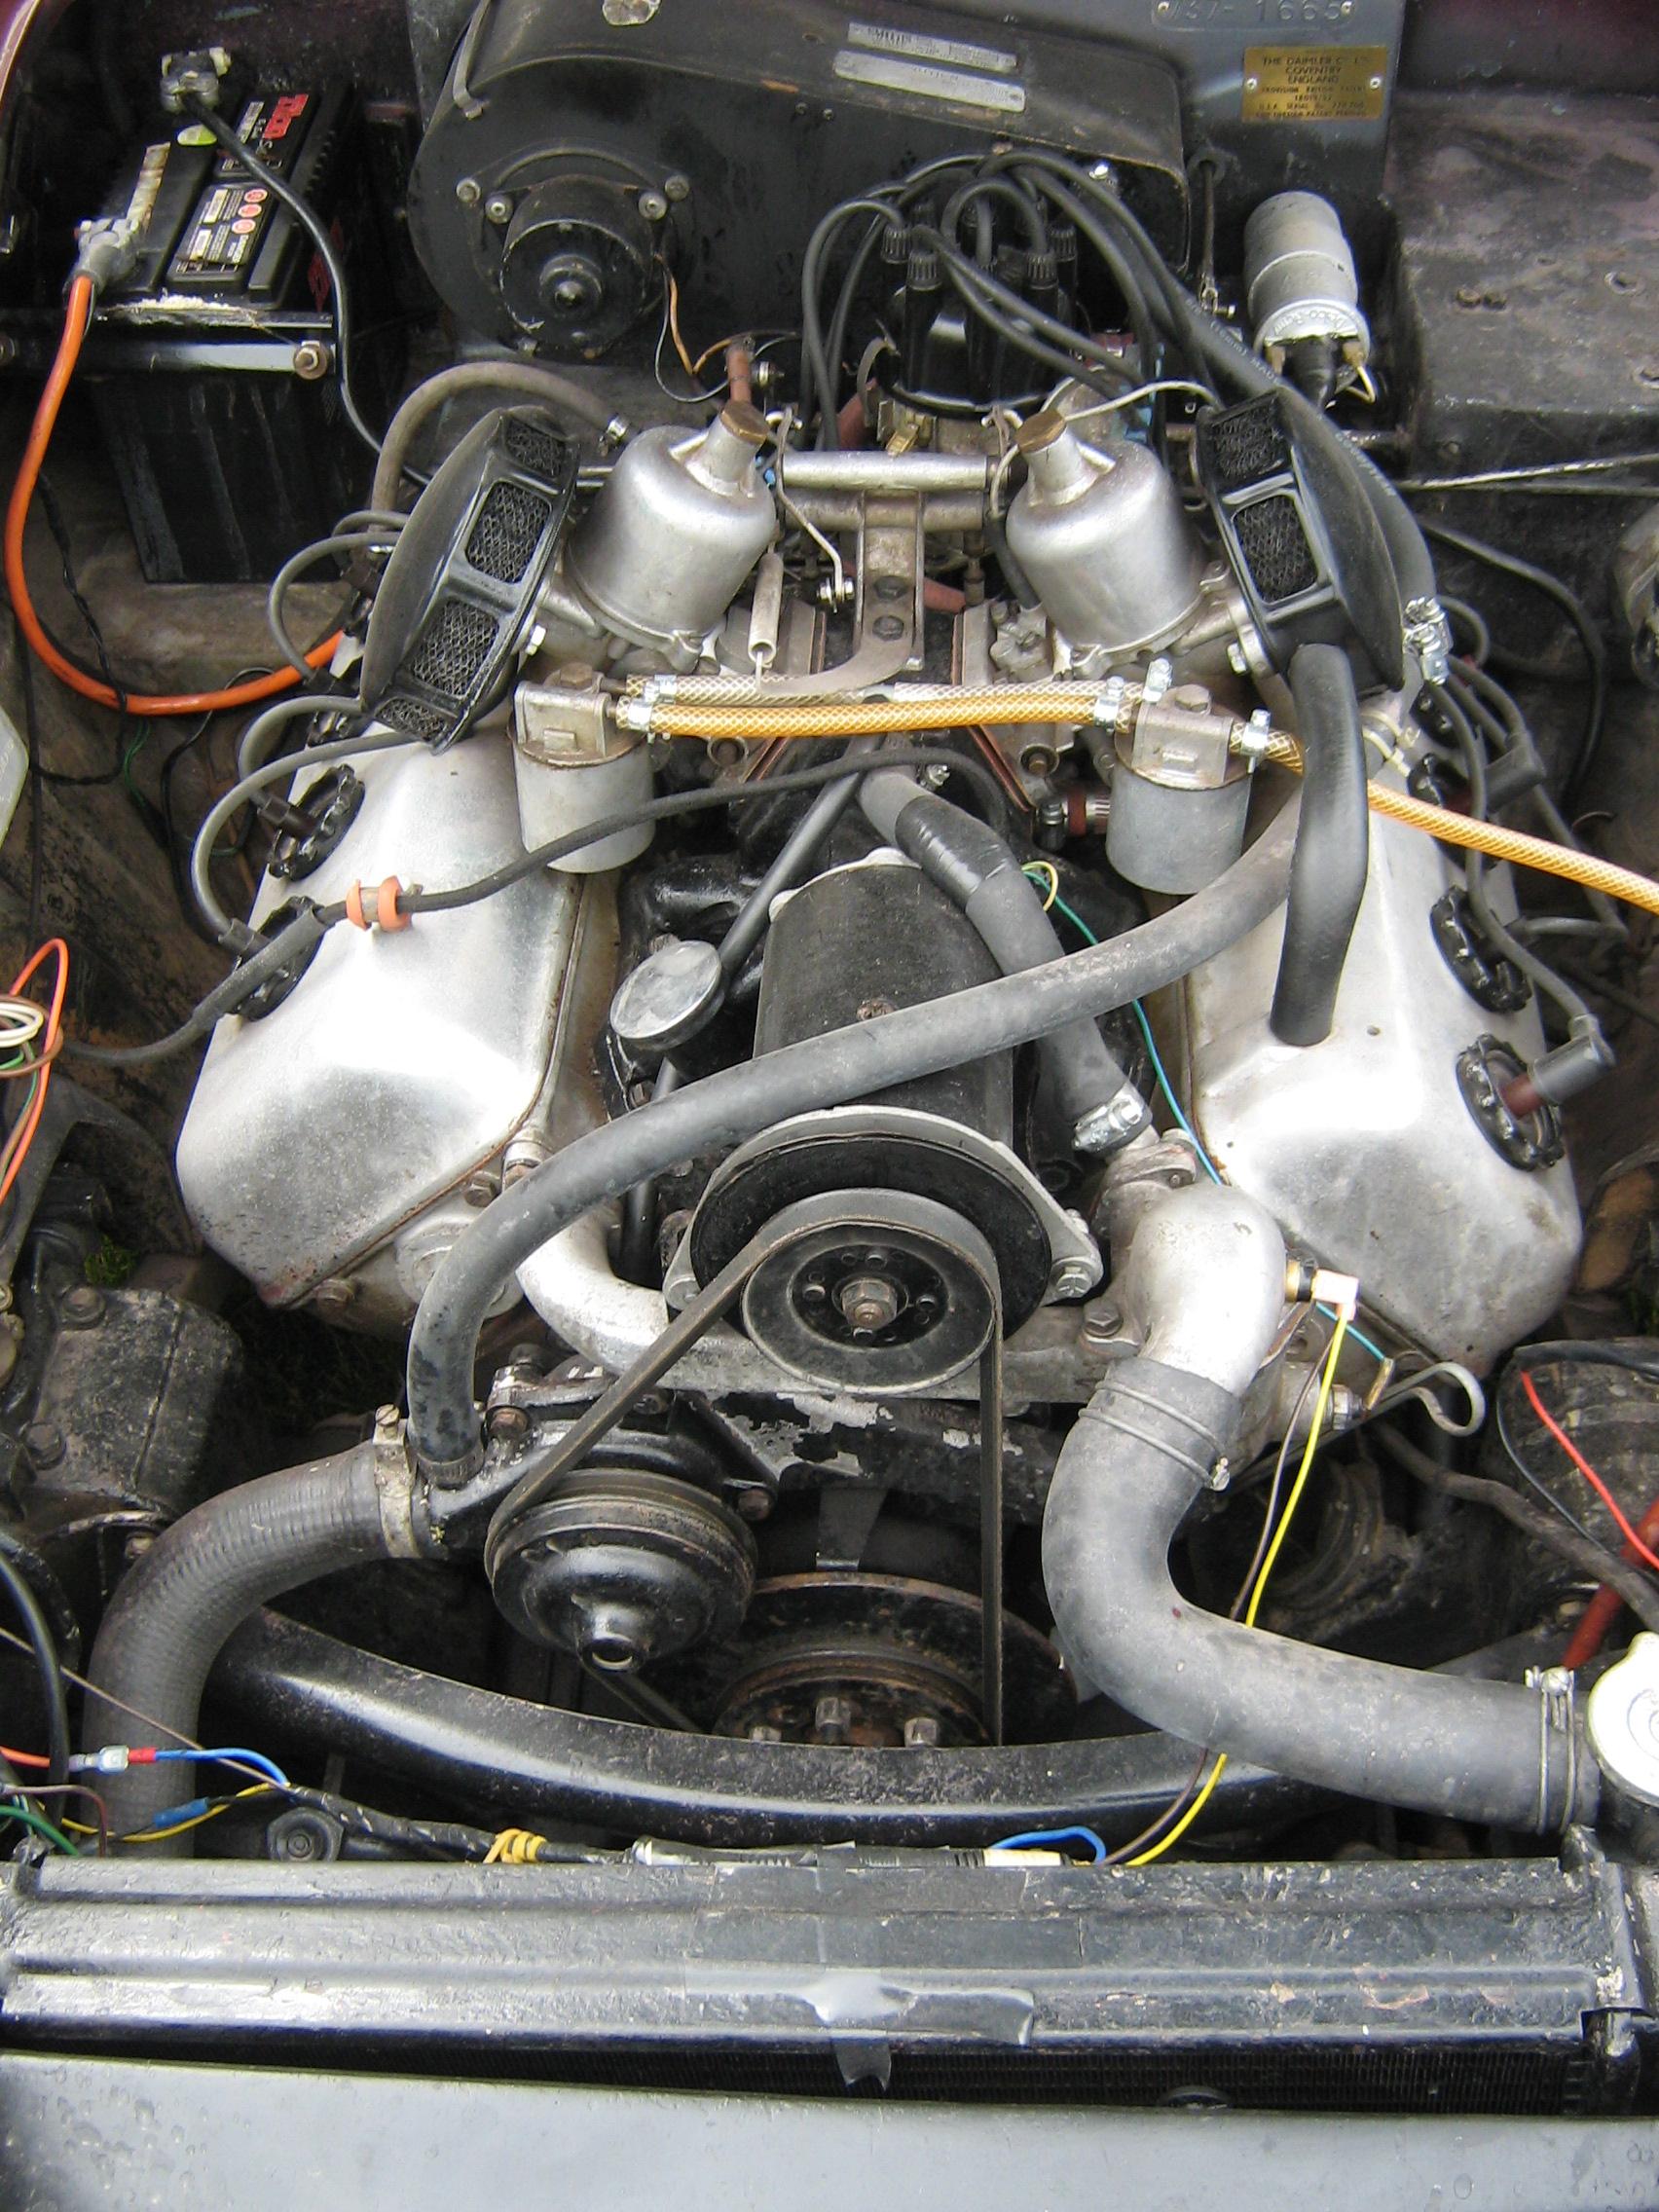 file daimler sp250 v8 engine 1963 3737131536 jpg wikimedia commonsfile daimler sp250 v8 engine 1963 3737131536 jpg